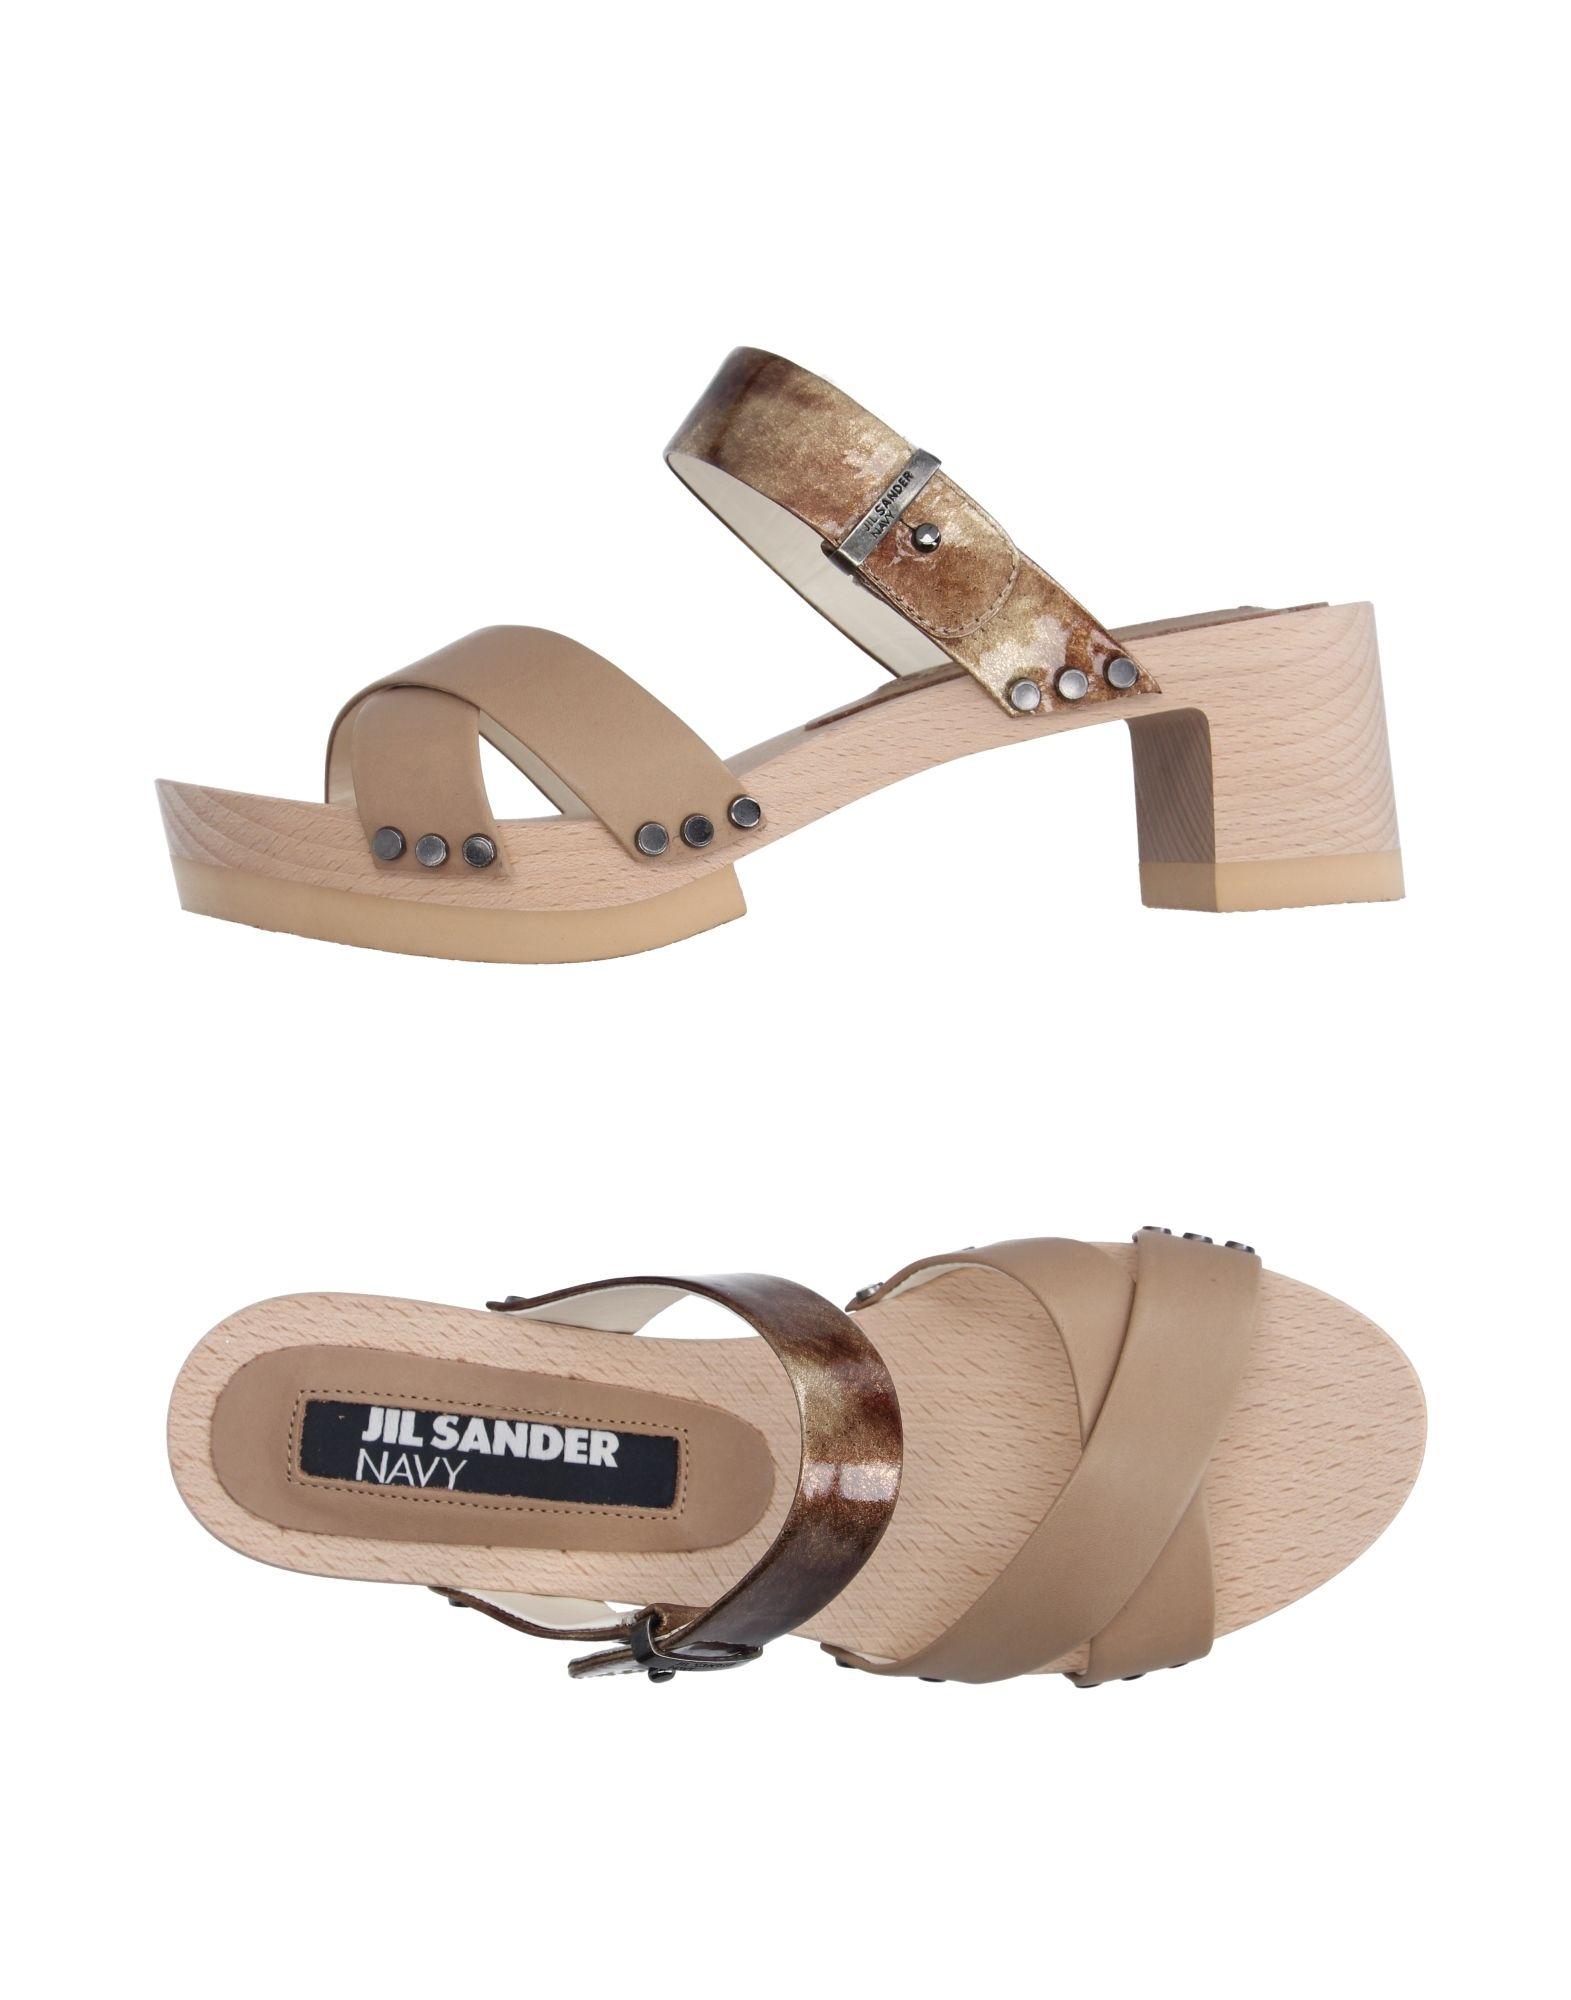 Jil Sander Pantoletten Navy Pantoletten Sander Damen  11167536VP Neue Schuhe b0426c